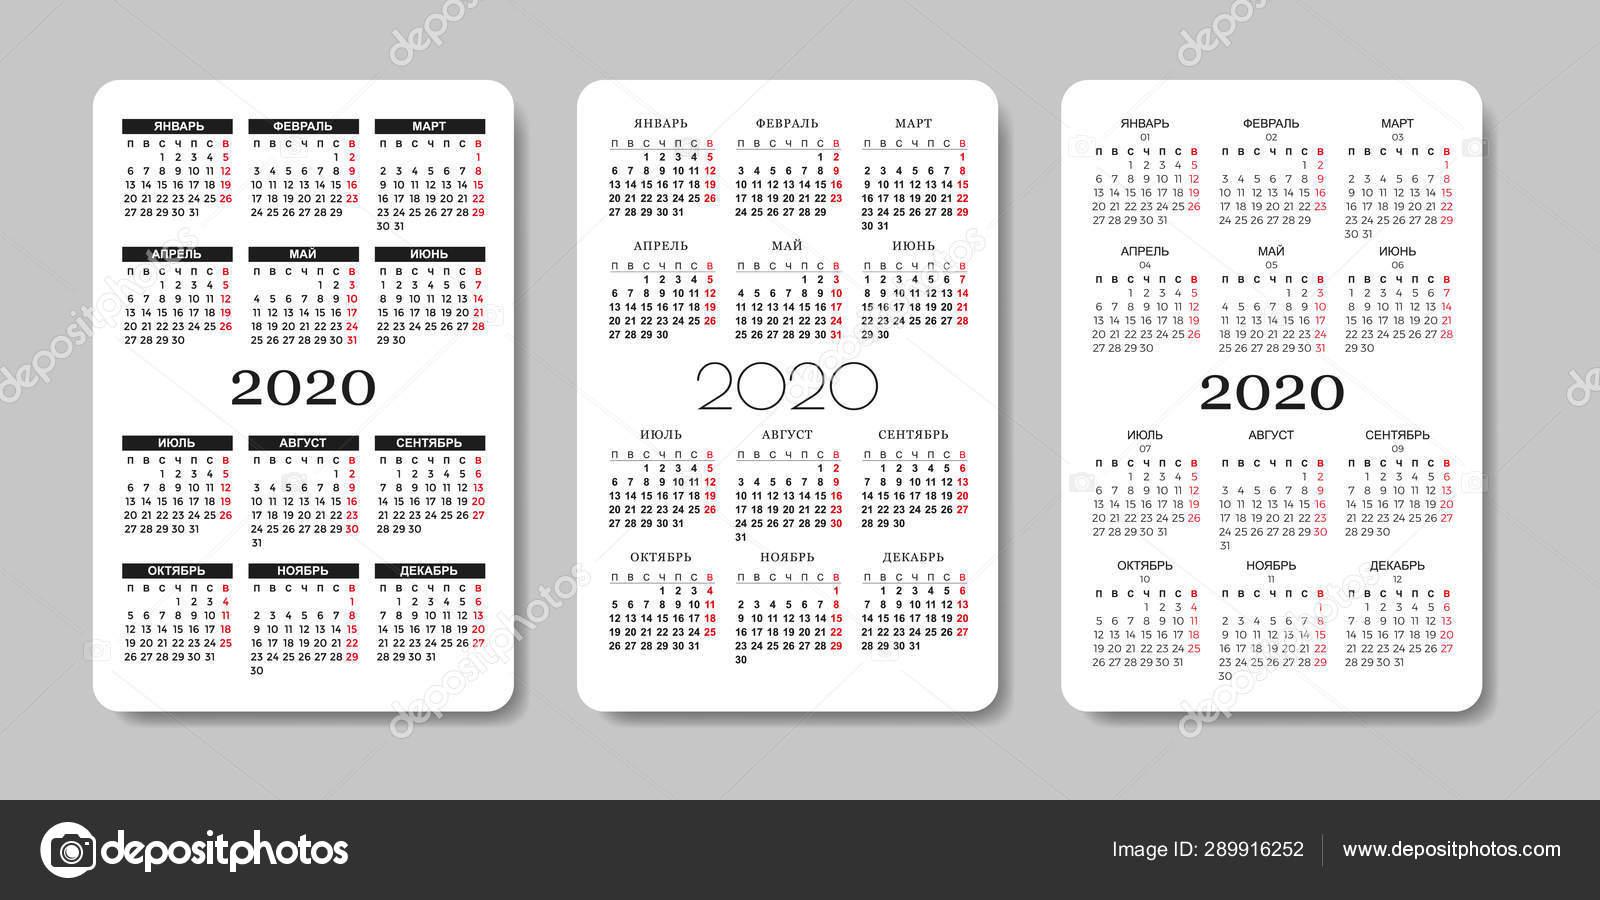 Calendar 2020 In Russian. Vector Design Template. 289916252 inside Depo Calendar